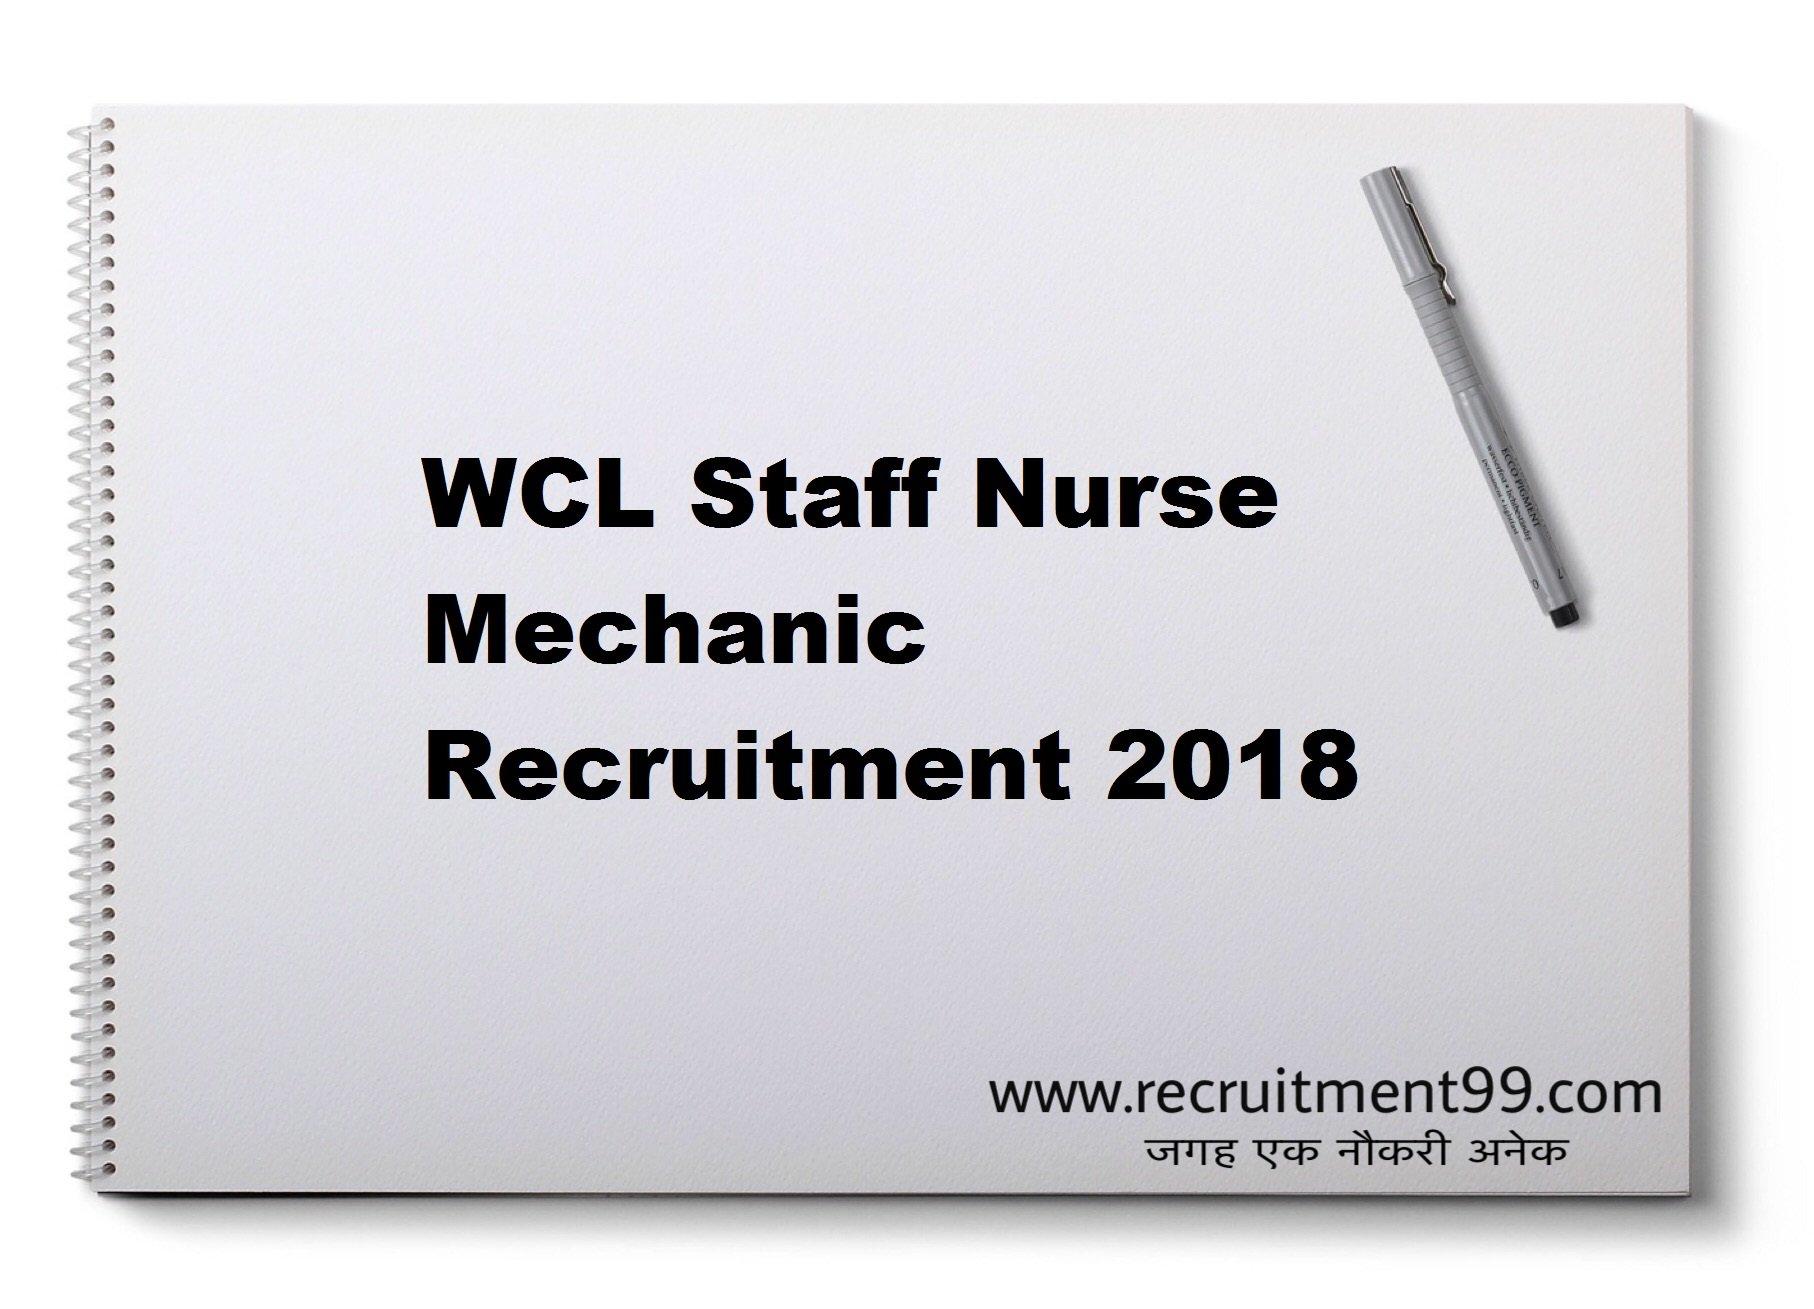 WCL Staff Nurse Mechanic Recruitment Admit Card Result 2018